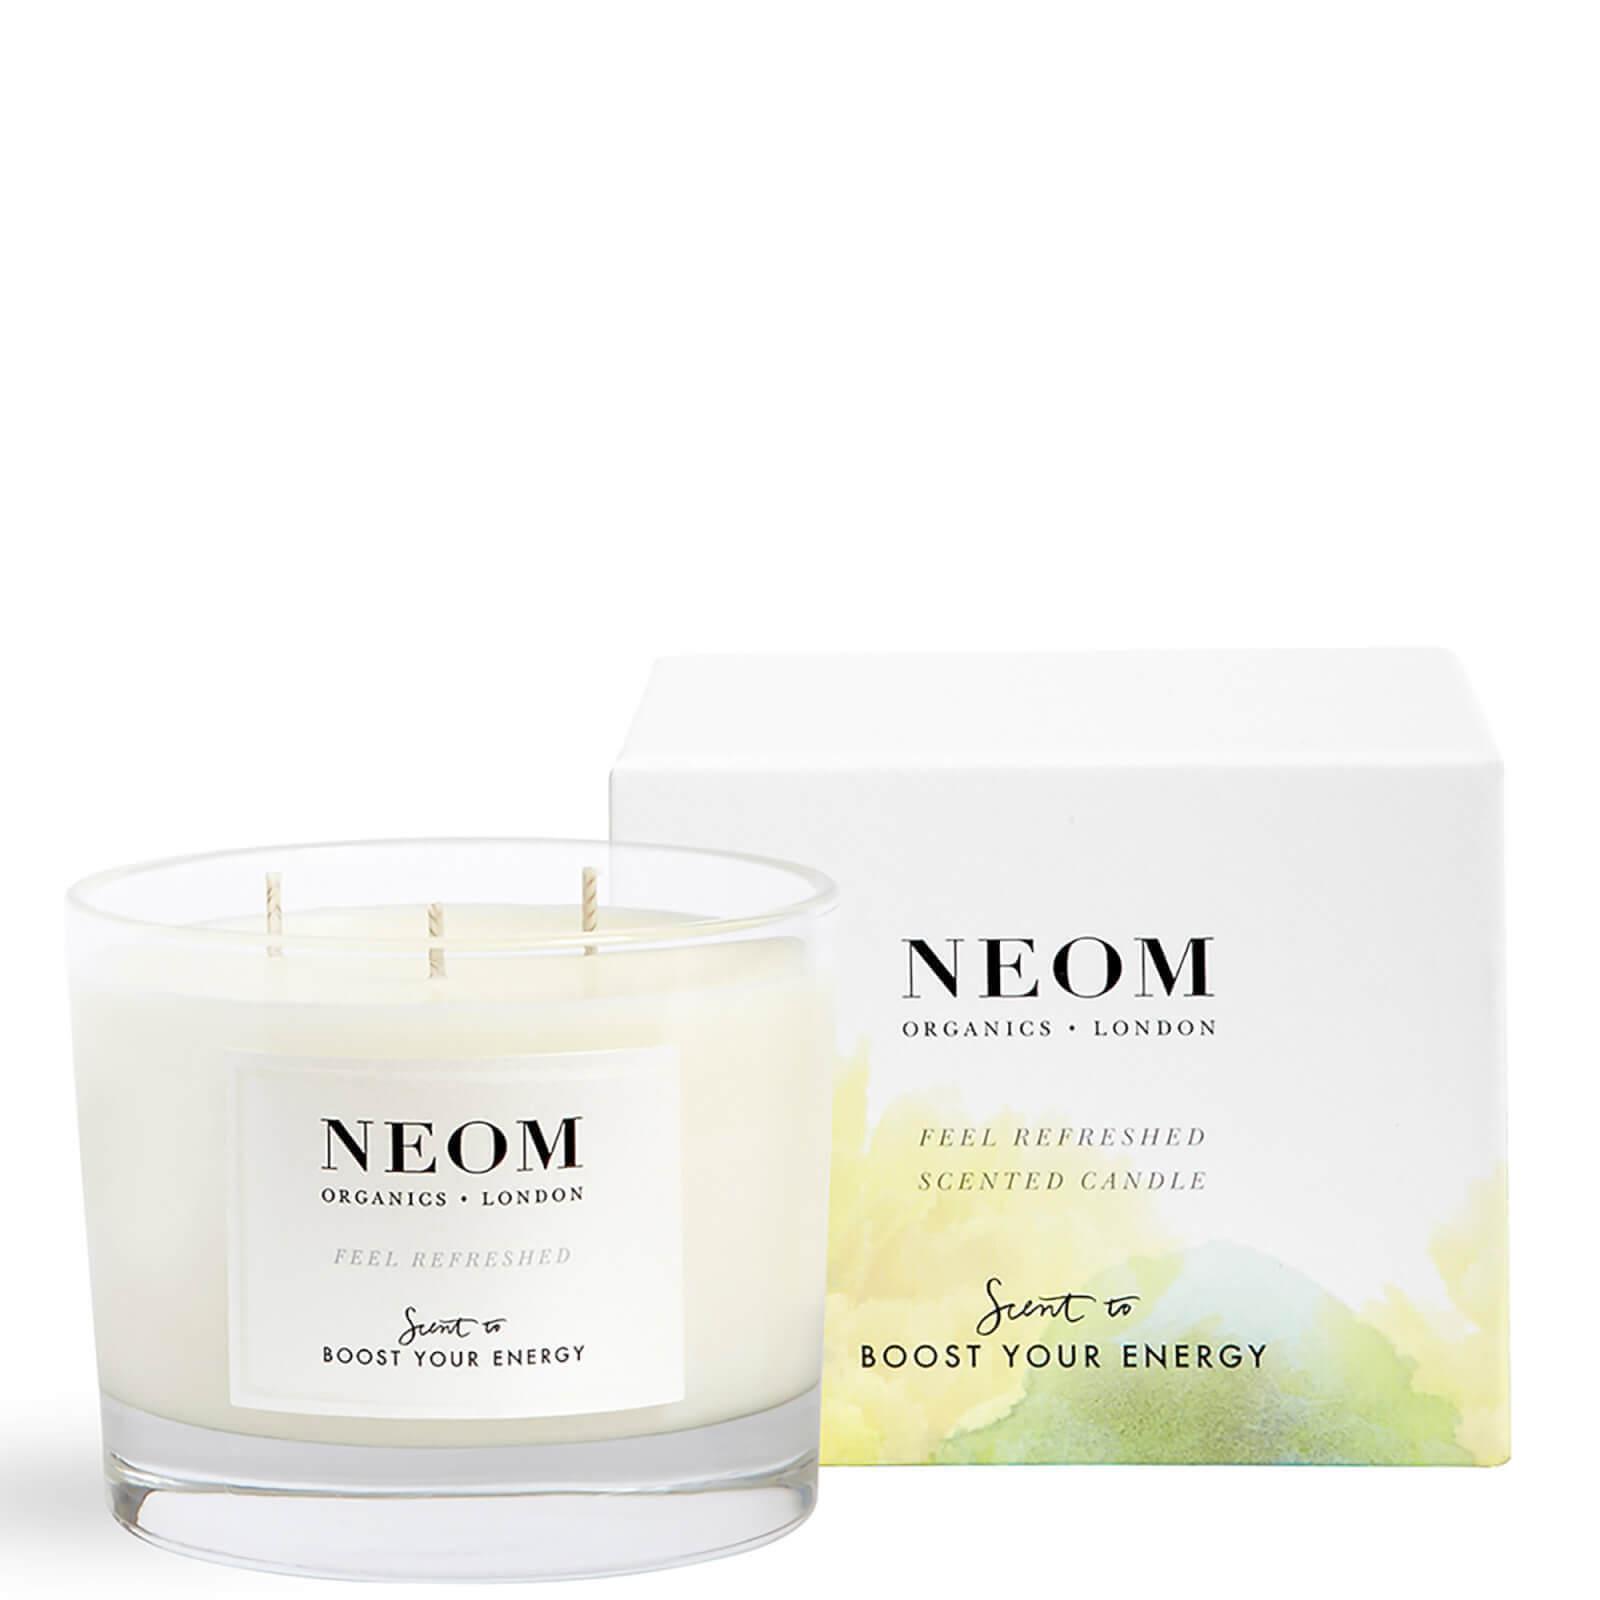 Купить Ароматическая свеча с тремя фитилями «Глоток свежести»NEOM Feel Refreshed Scented 3 Wick Candle